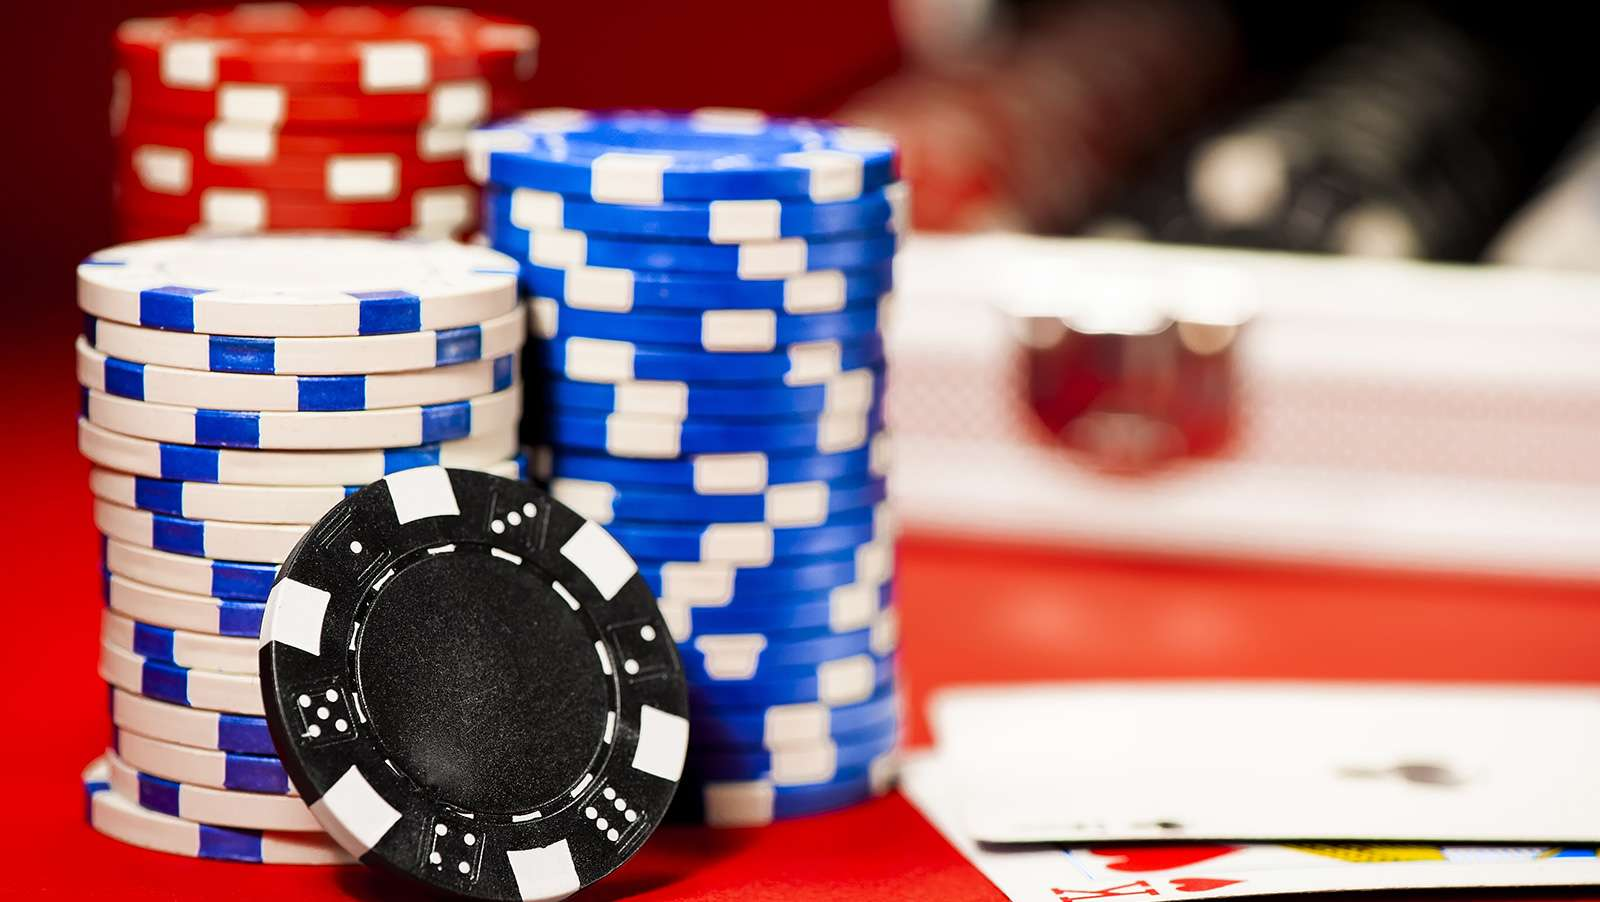 WPT Borgata Winter Poker Open: Vinicius Lima beats Dave Farah to take the title